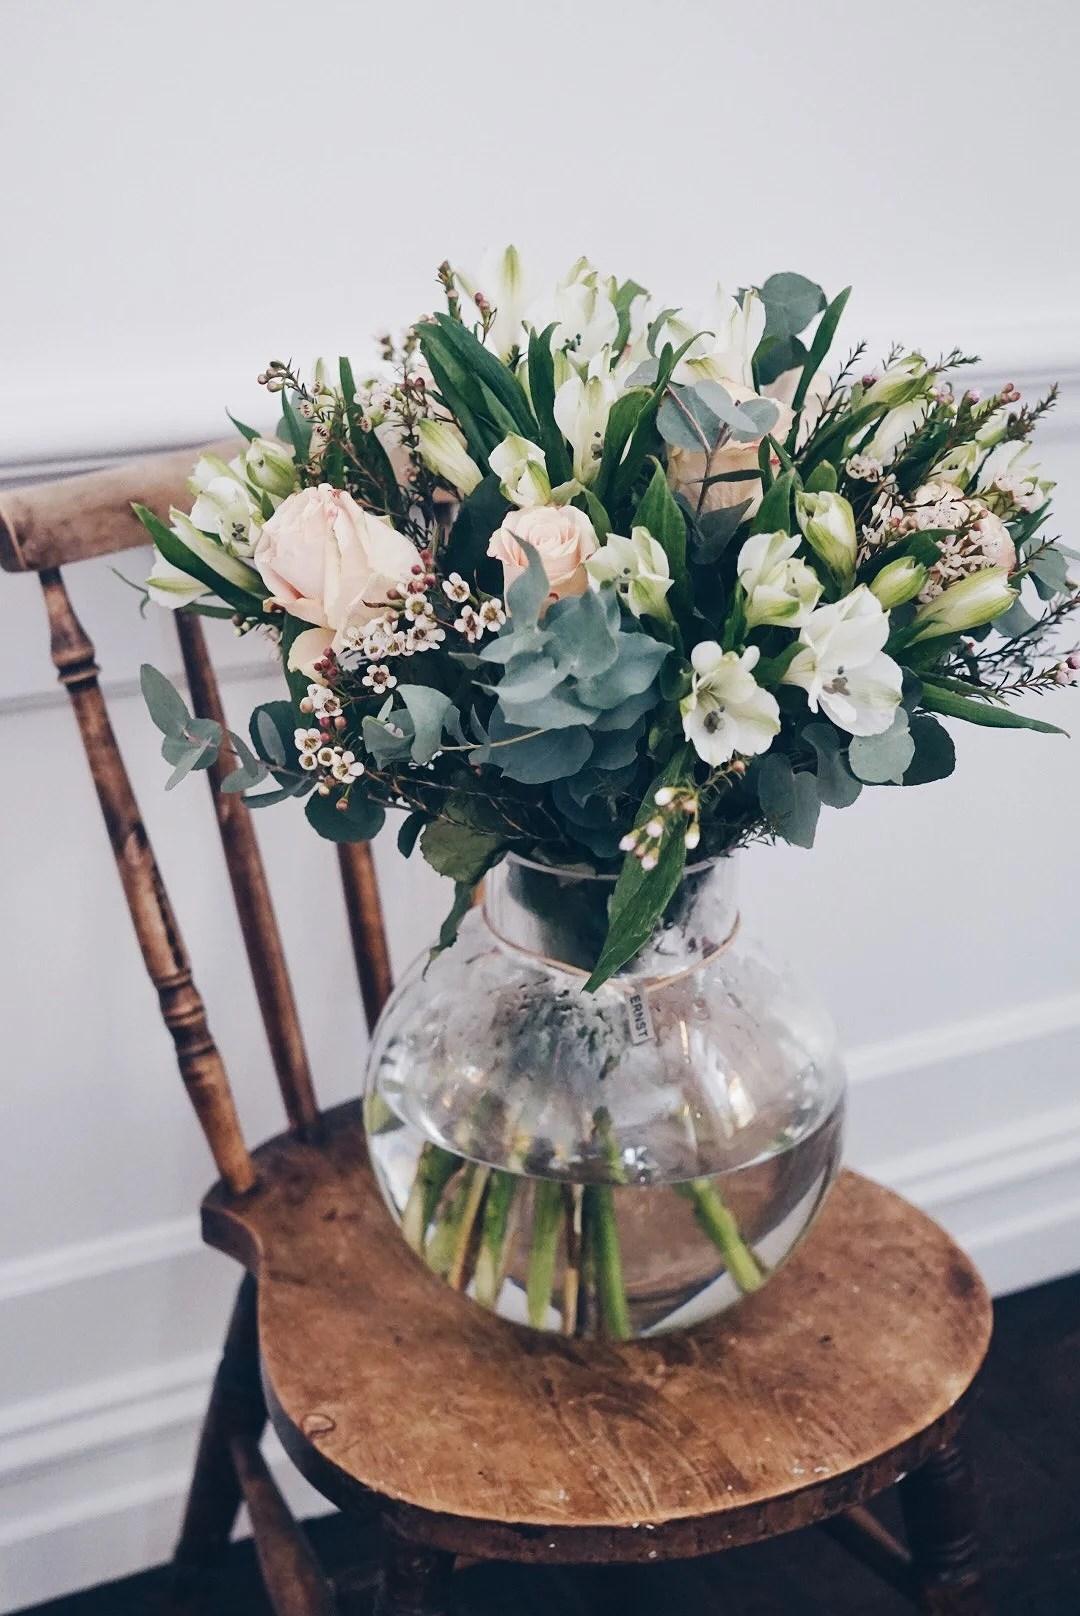 Blommor, blommor och blommor